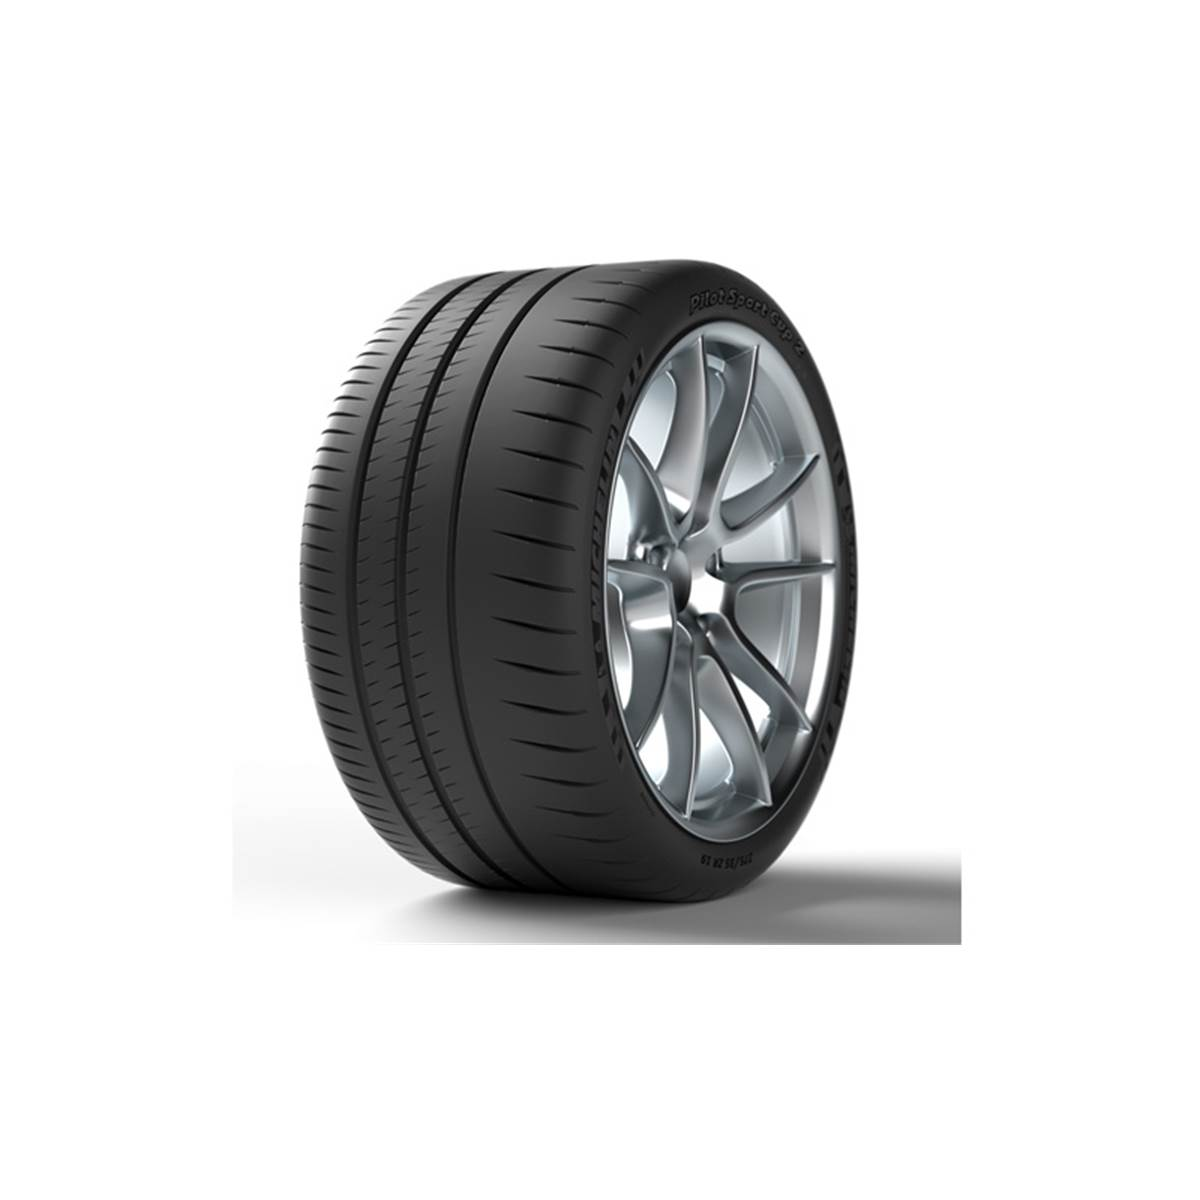 Pneu Michelin 305/30R20 103Y Pilot Sport Cup 2 XL